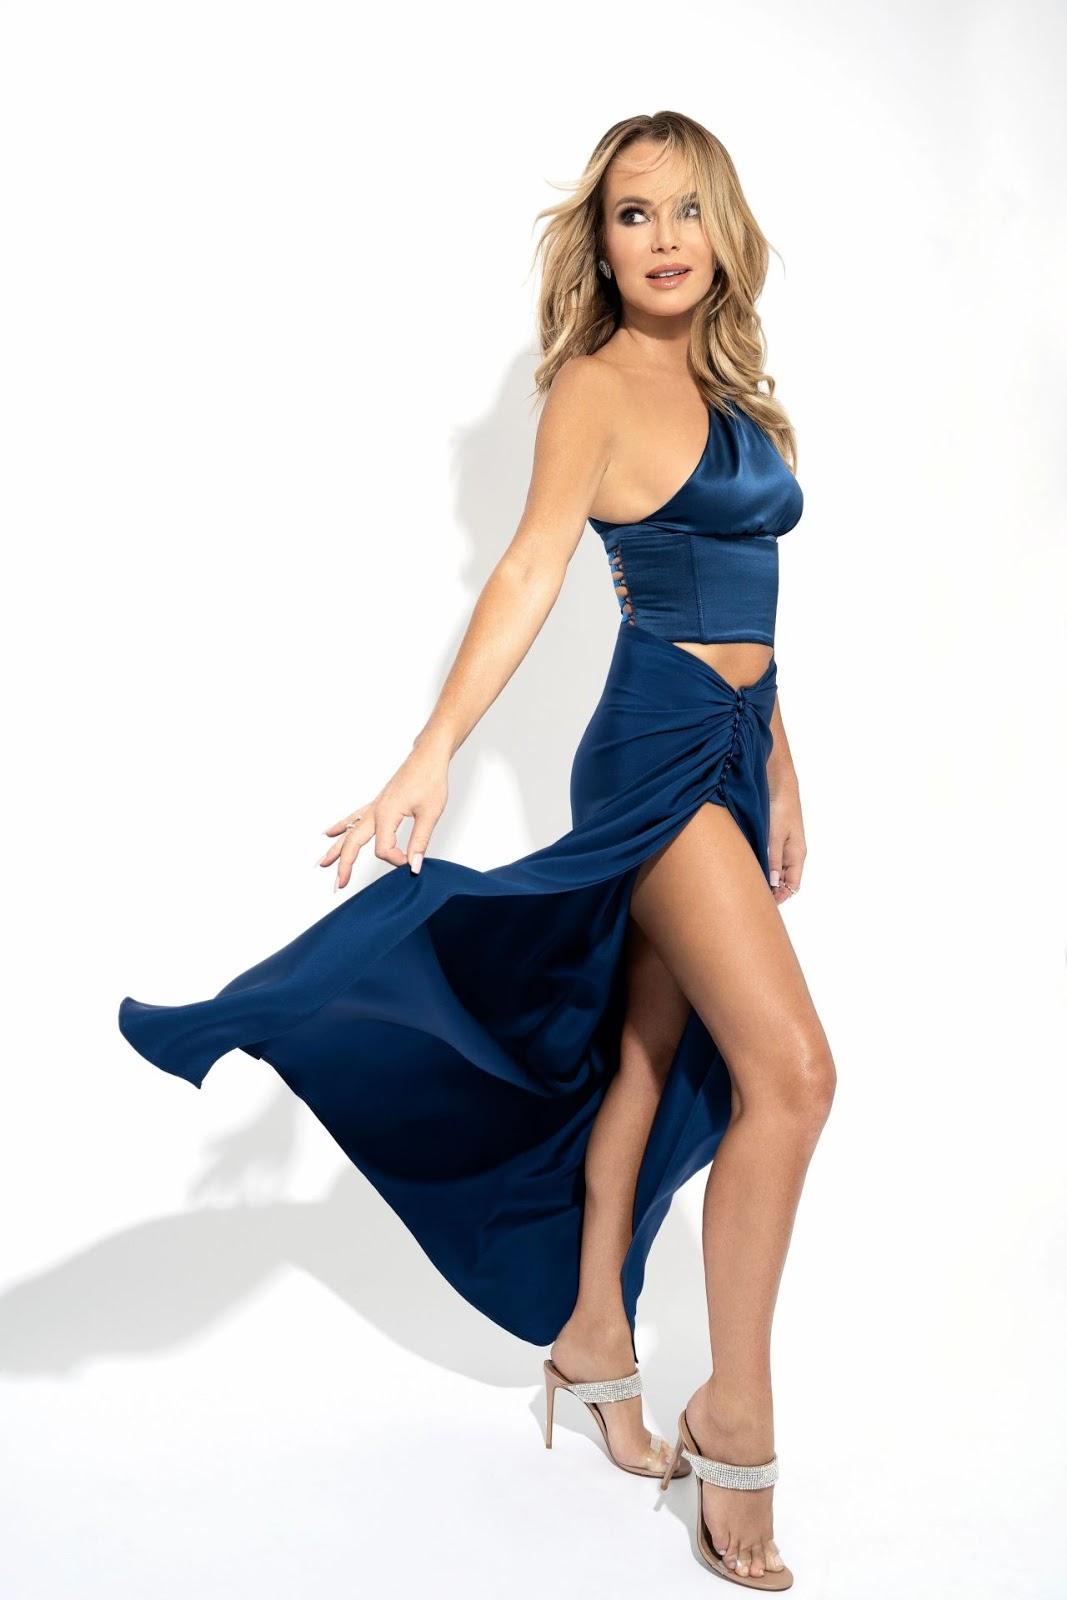 Amanda Holden Topless amanda holden photoshoot – june 2019 | ritzystar